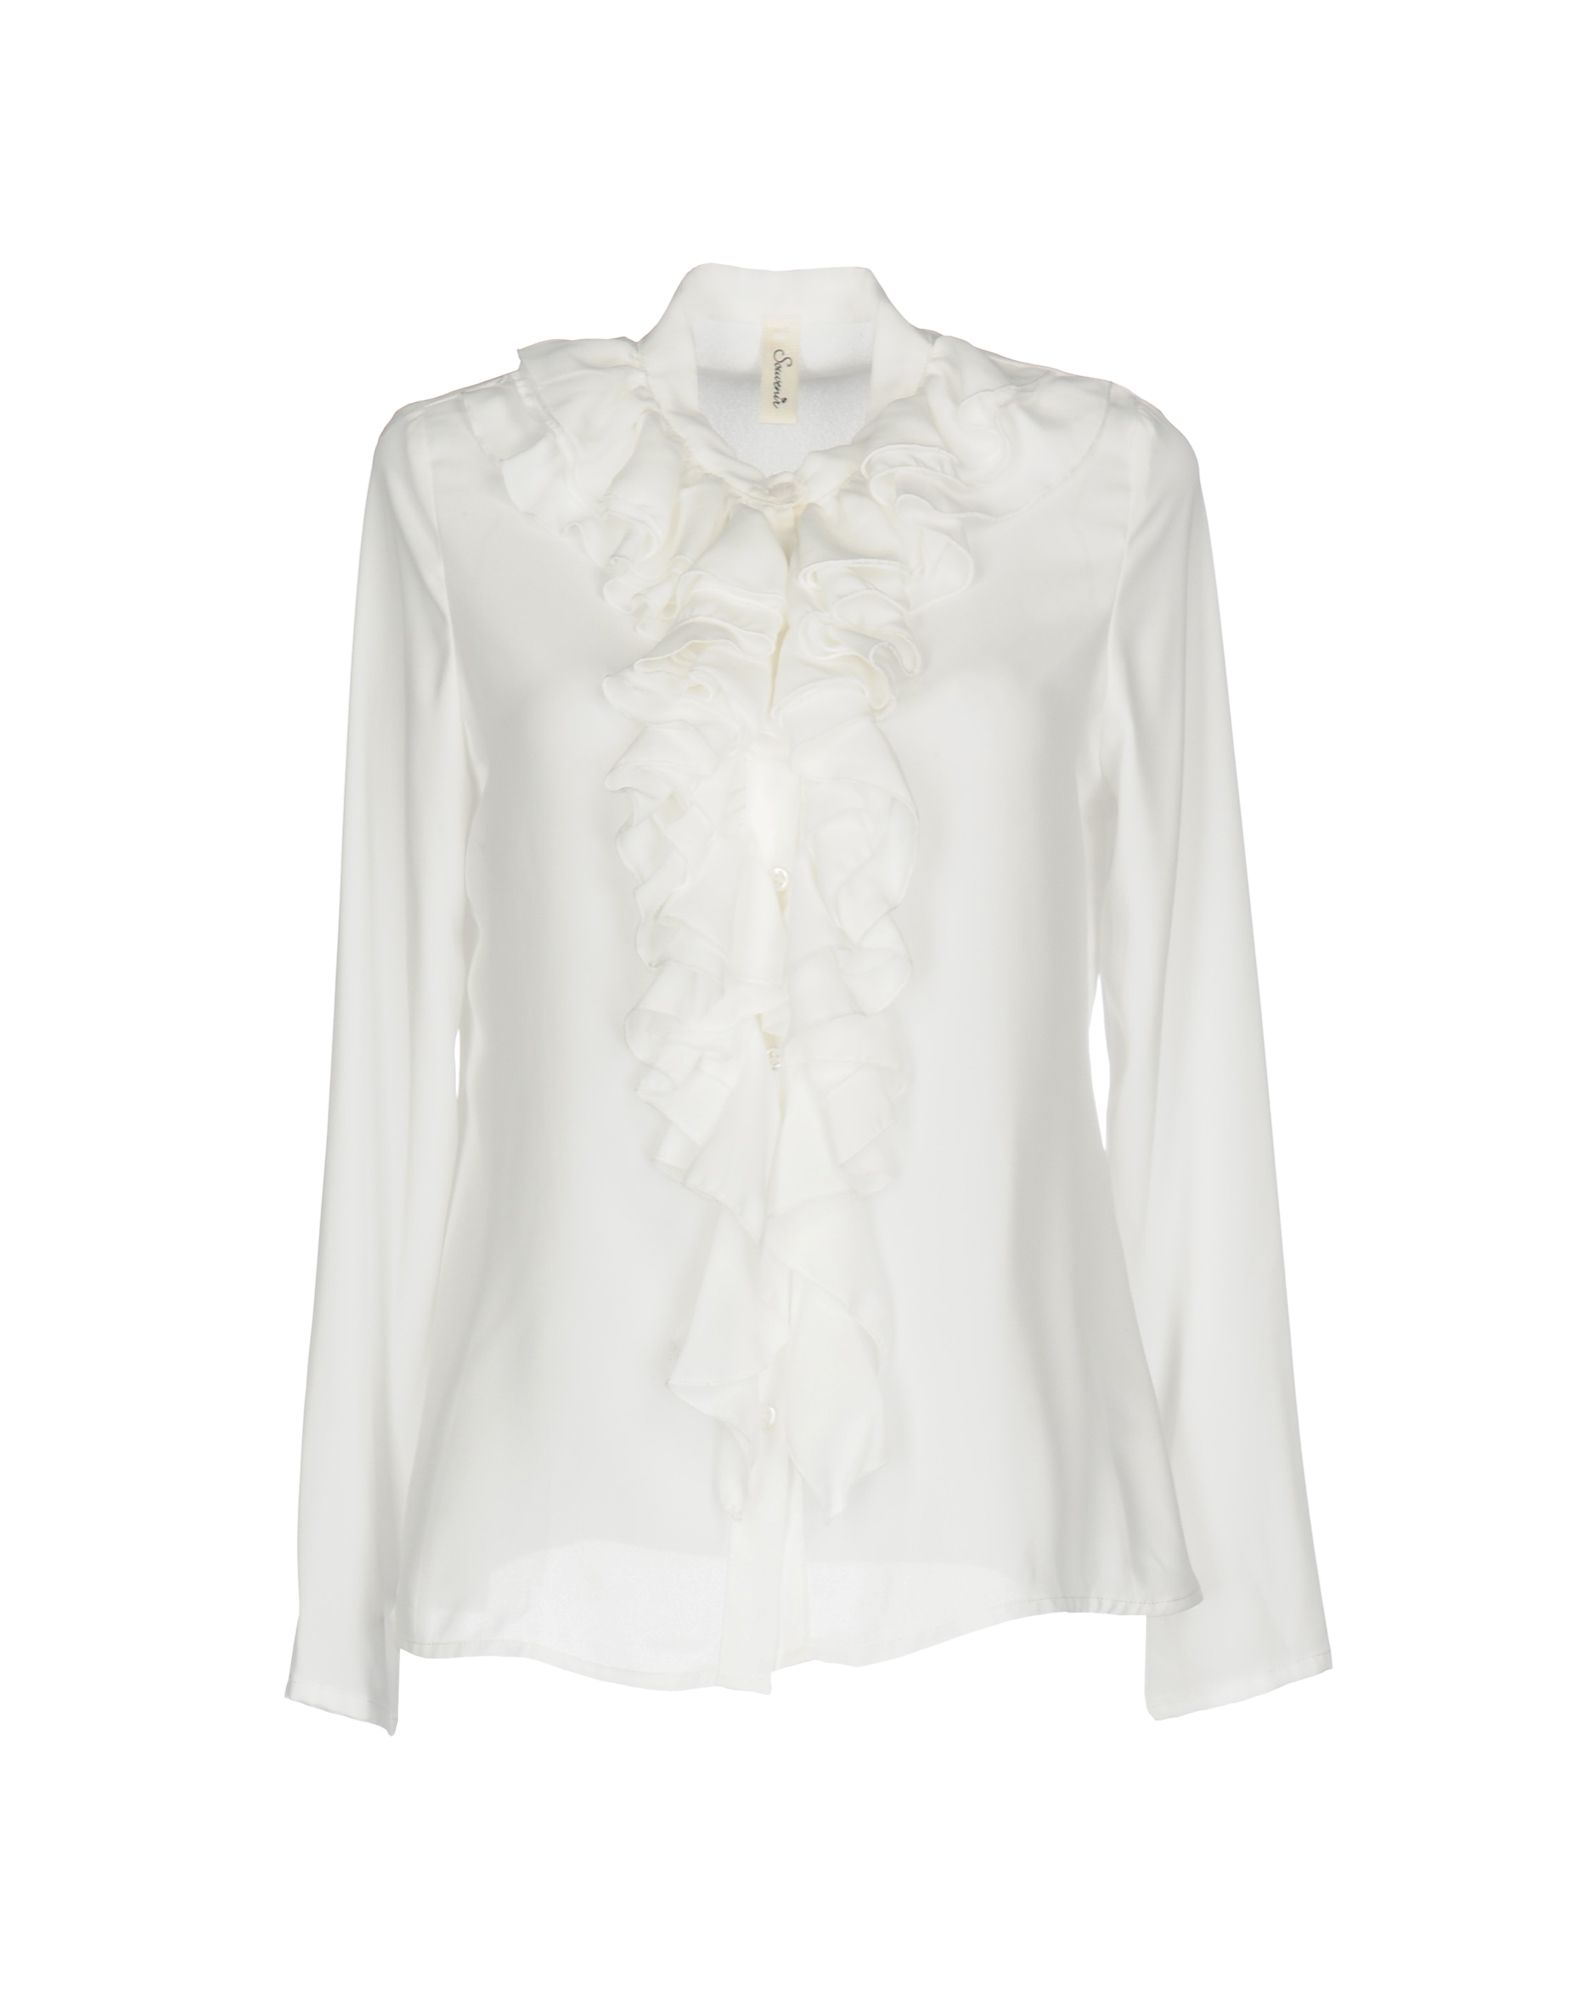 SOUVENIR Damen Hemd Farbe Weiß Größe 4